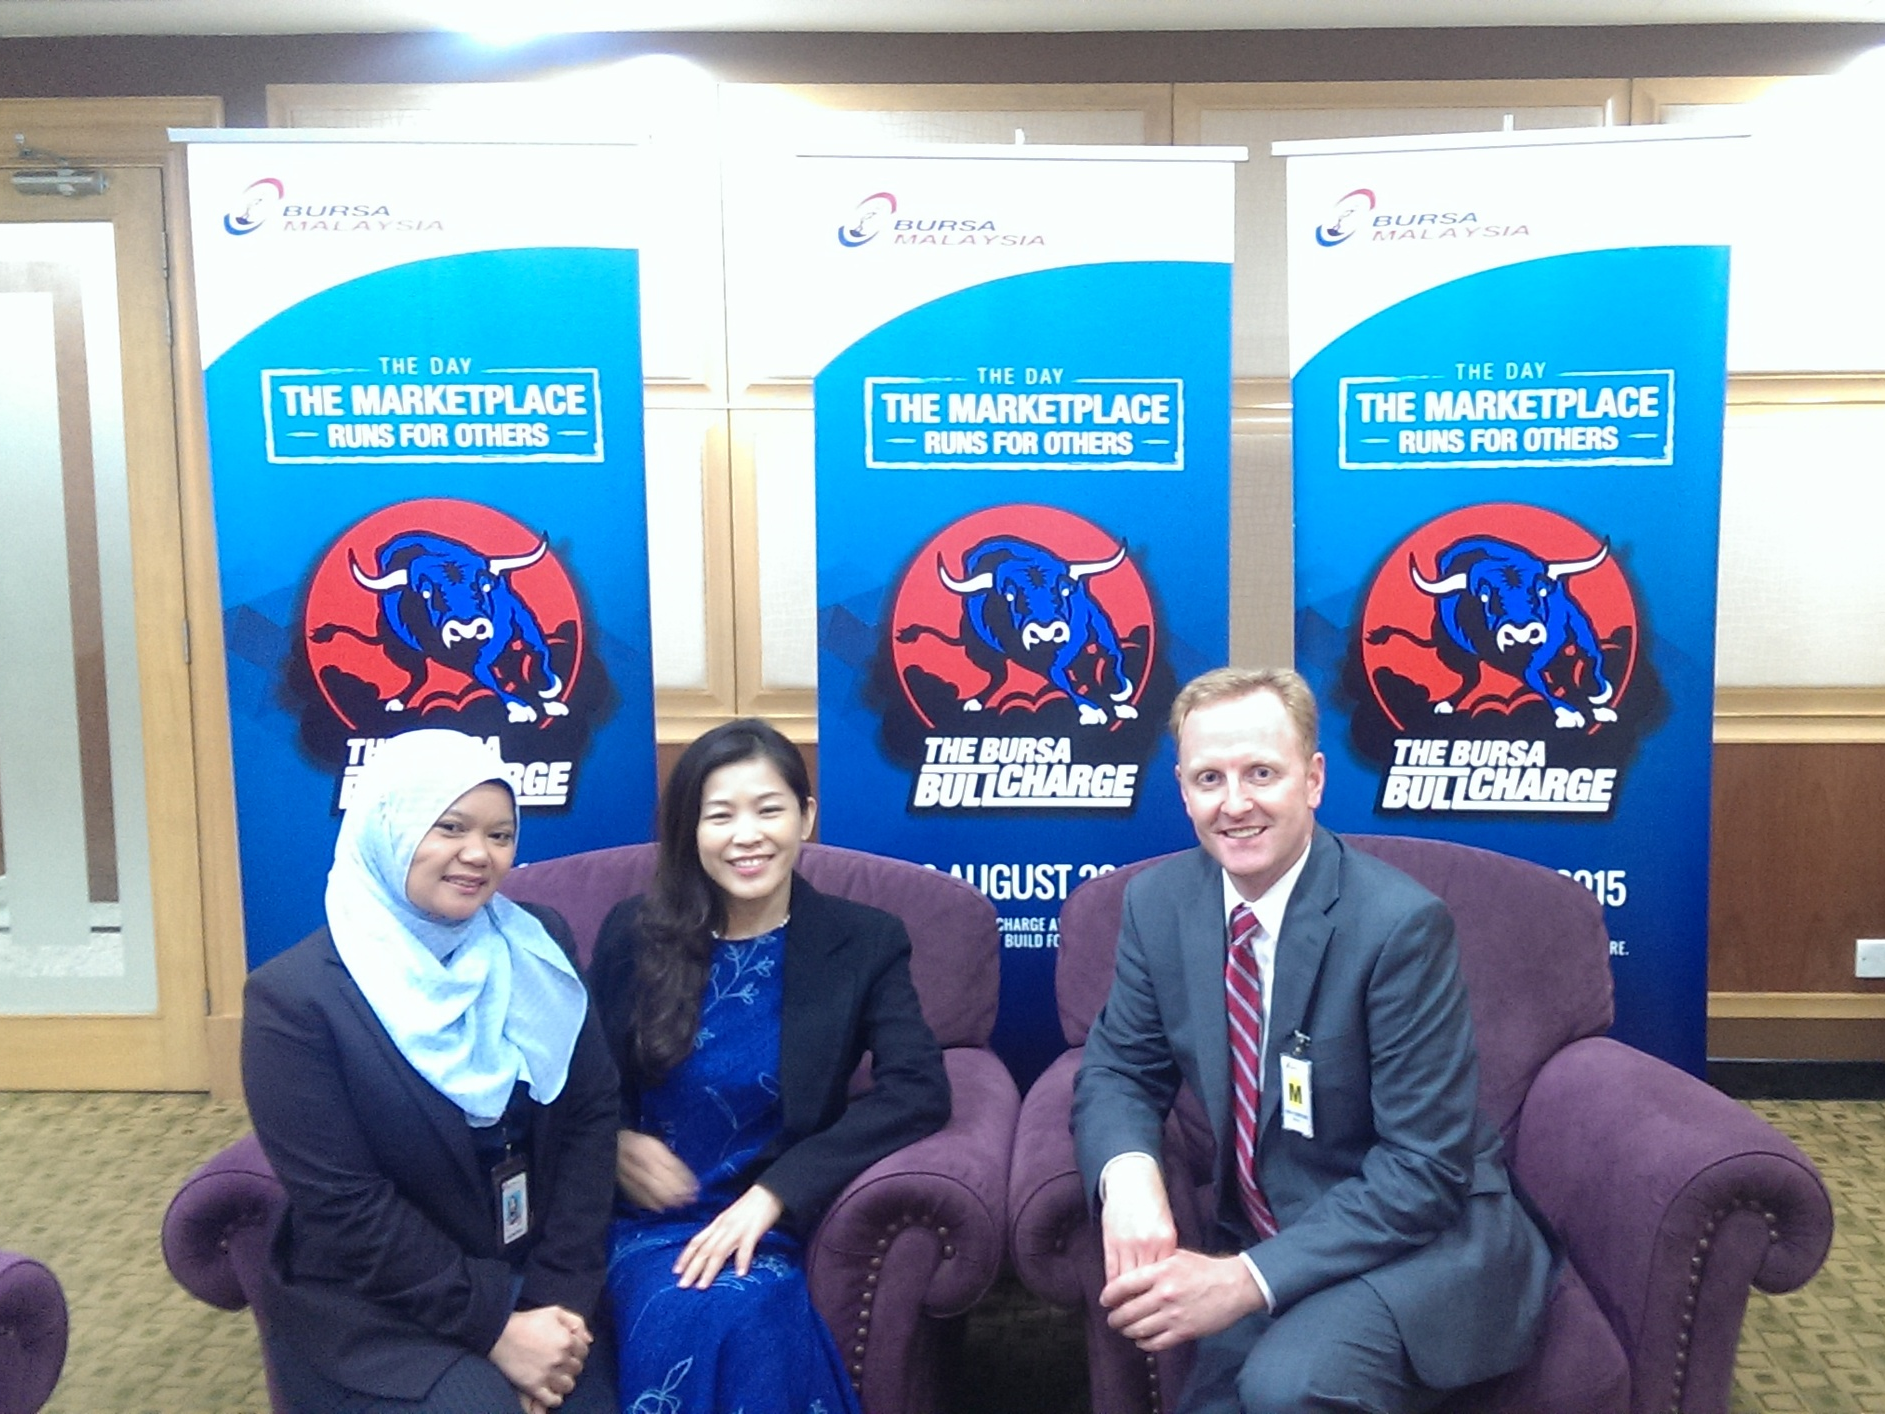 Ryan Hessenthaler with Koay Lean Lee and Rasmona Abdul Rahman of Bursa Malaysia